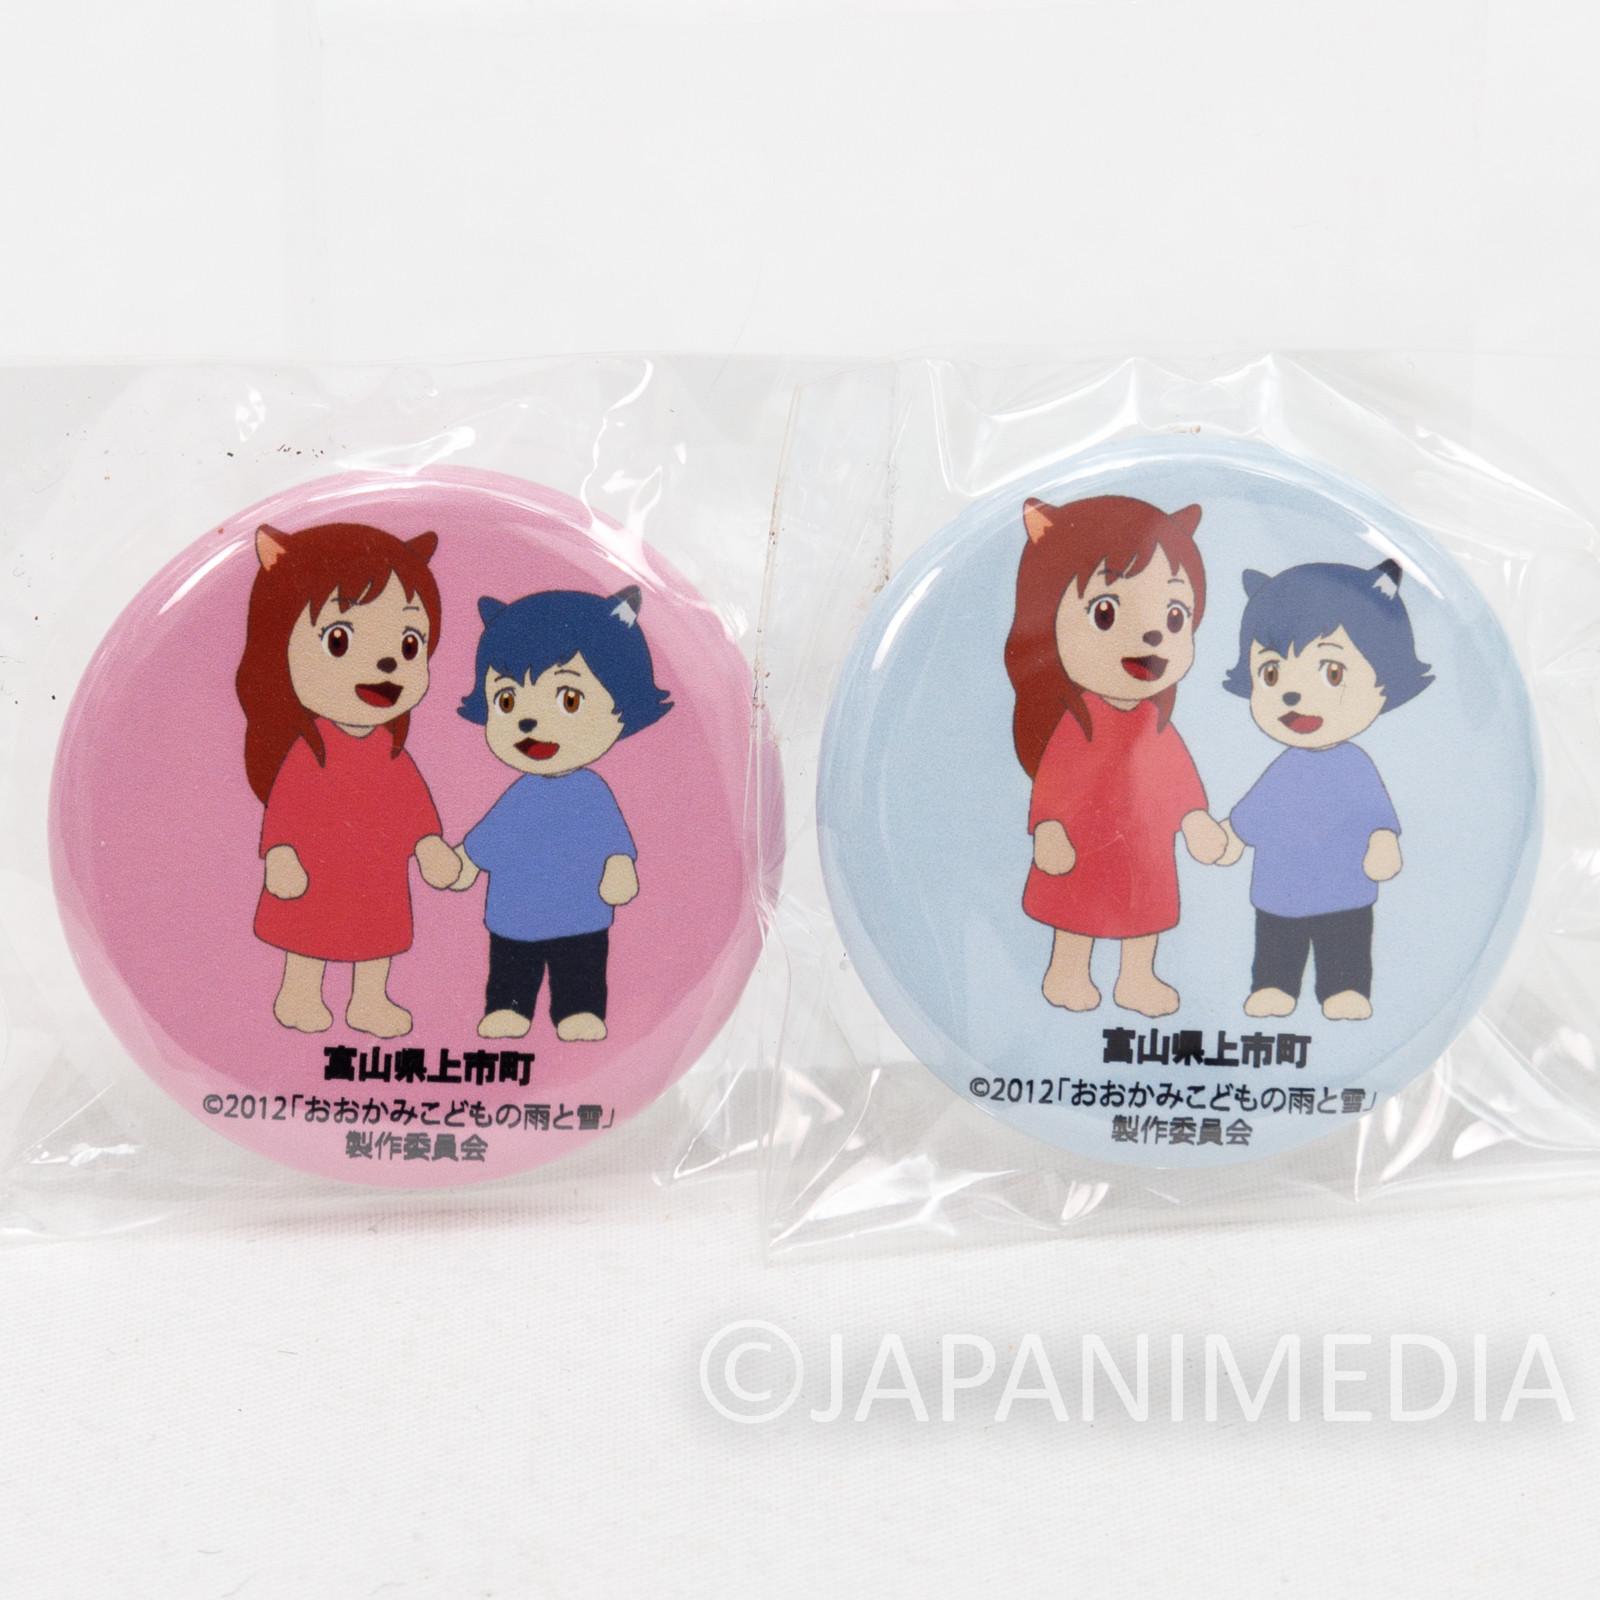 Wolf Children Ame and Yuki  Button Badge 2pc Set JAPAN ANIME